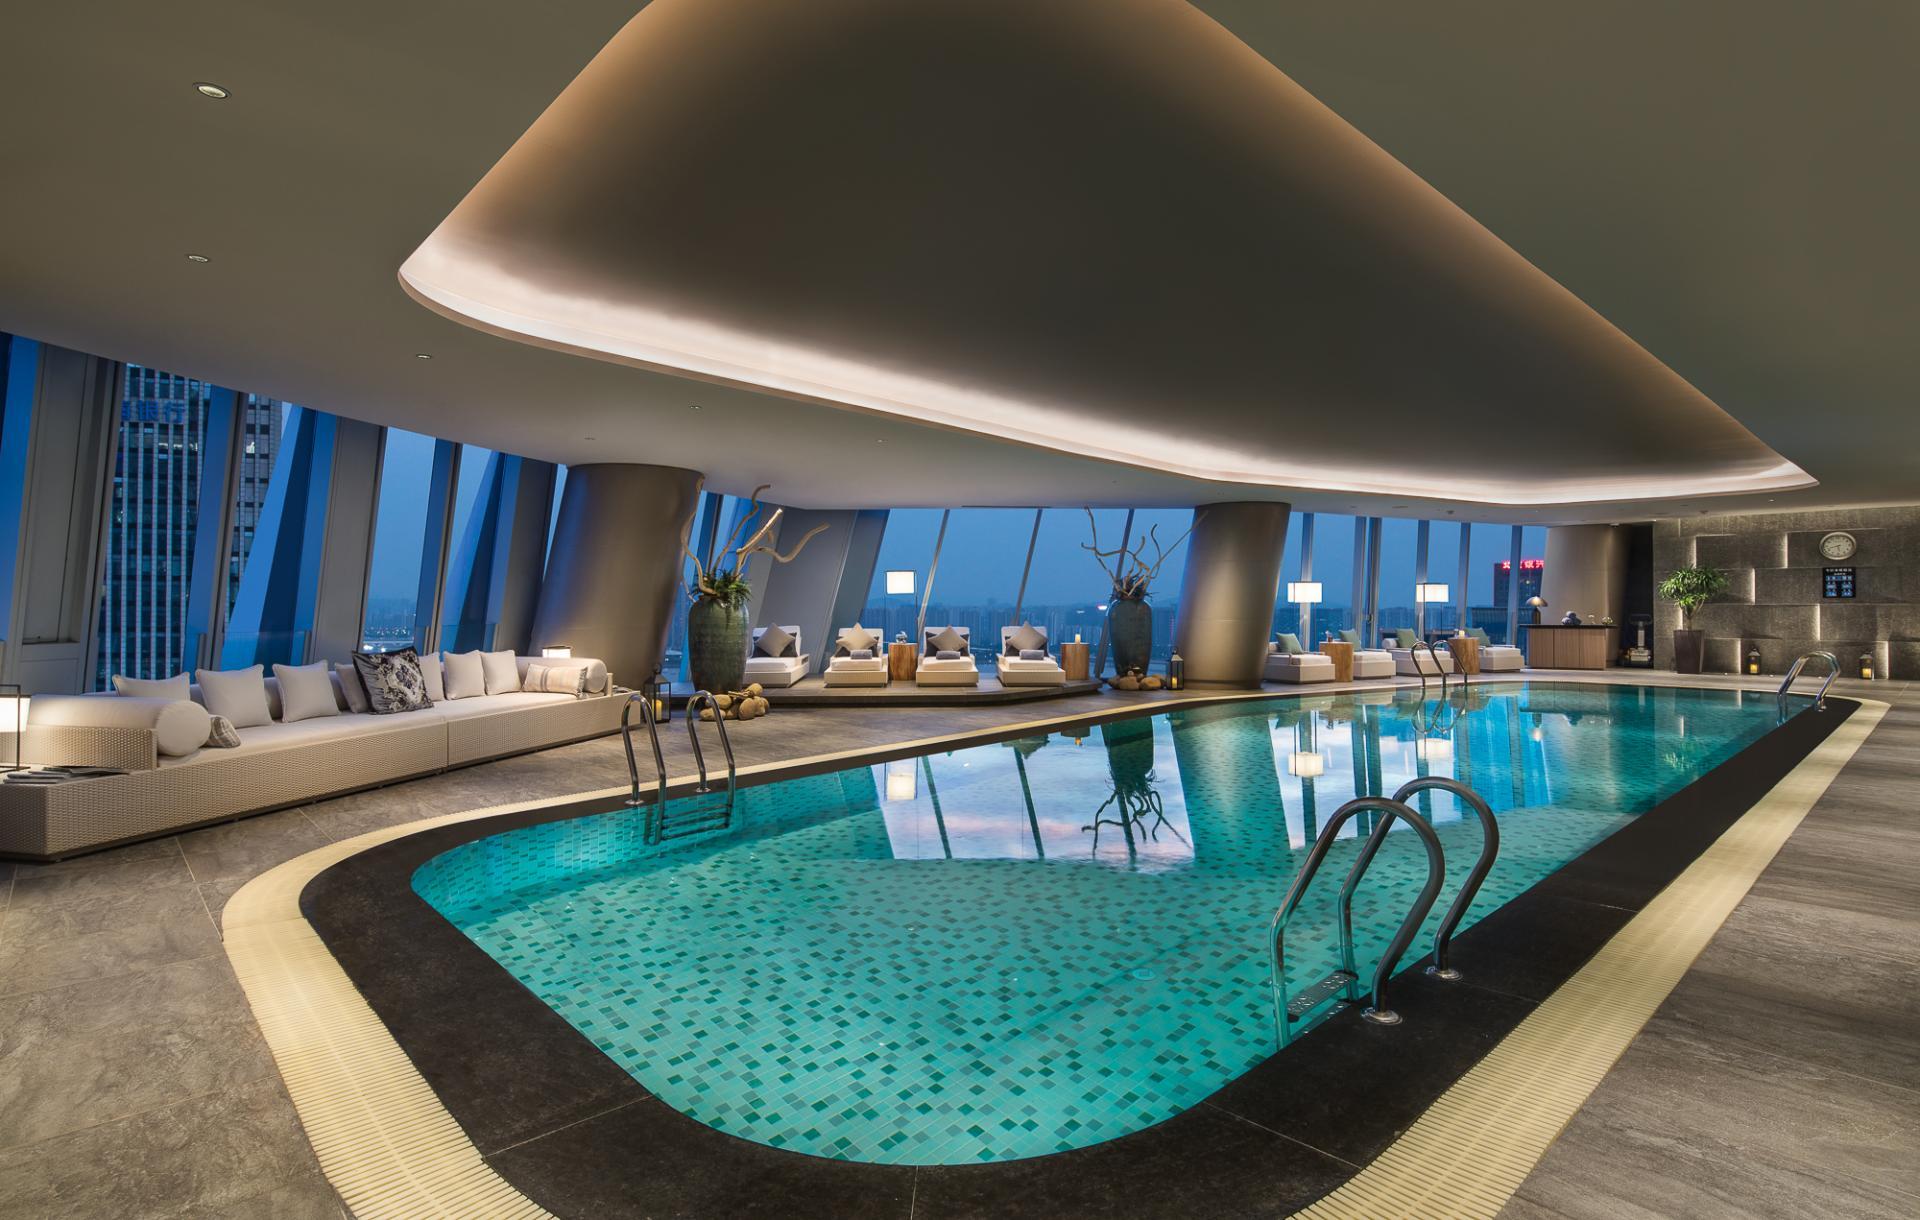 Pool at Ascott Raffles City Hangzhou Apartment